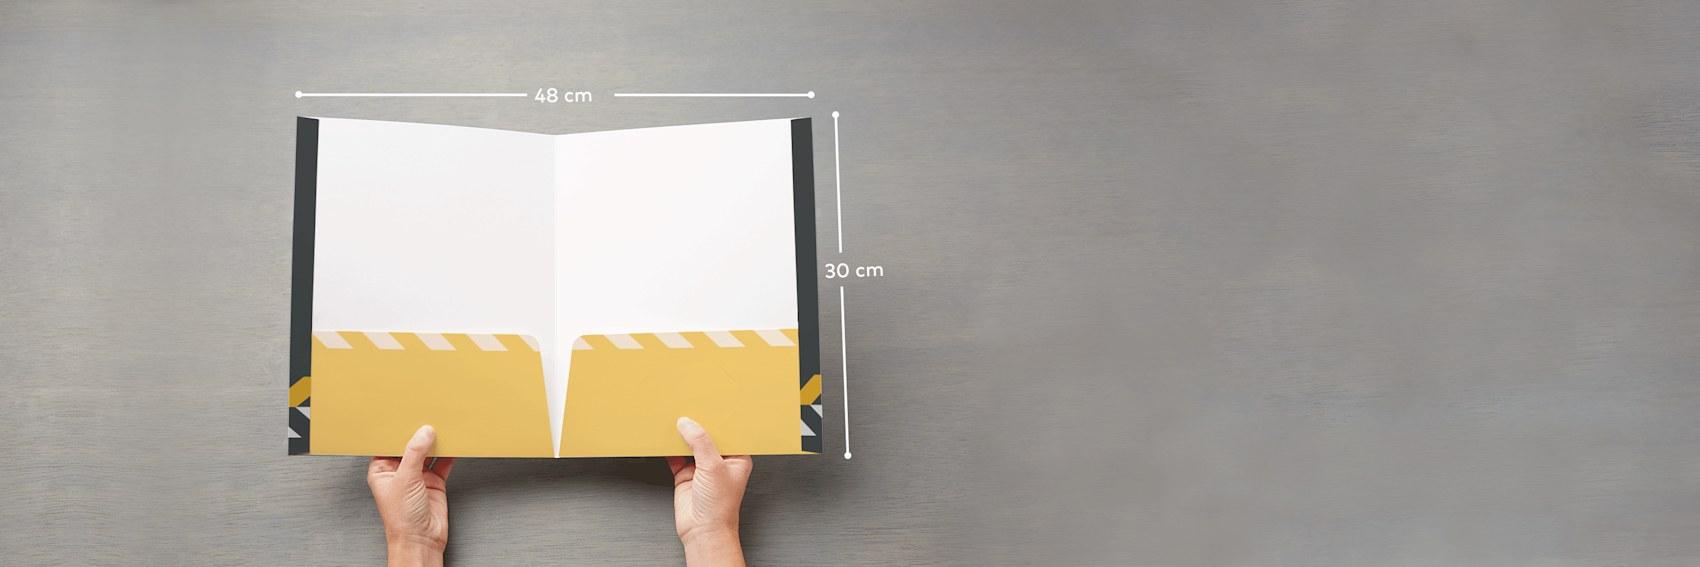 Cartelle Da Presentazione Stampa Di Cartelline Personalizzate Vistaprint